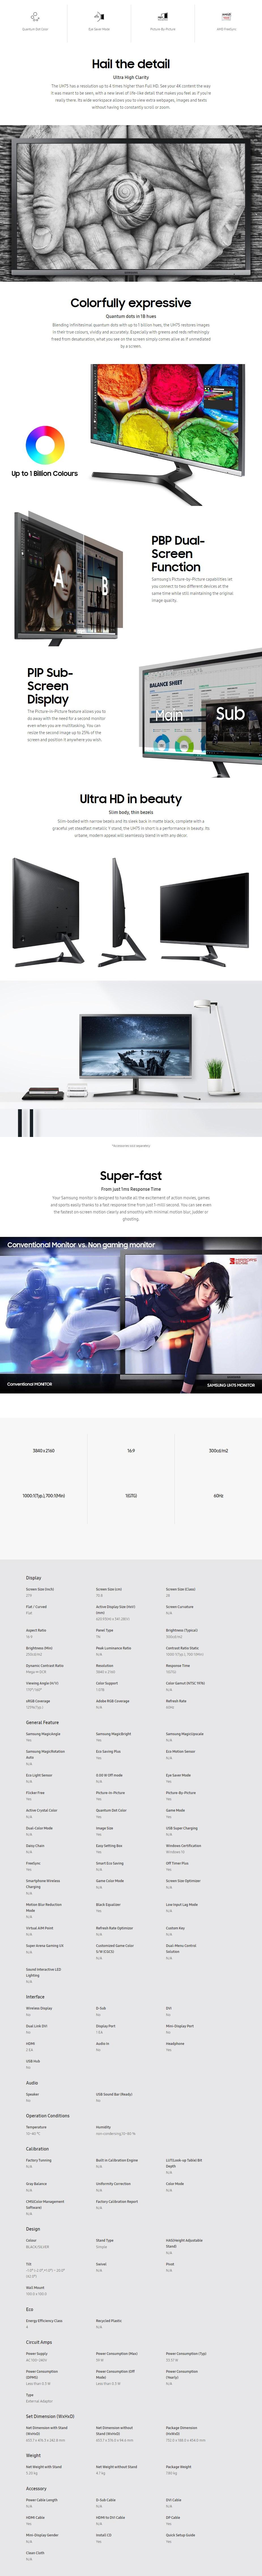 "Samsung LU28H750U 28"" 4K UHD Quantum Dot FreeSync Monitor - Overview 1"